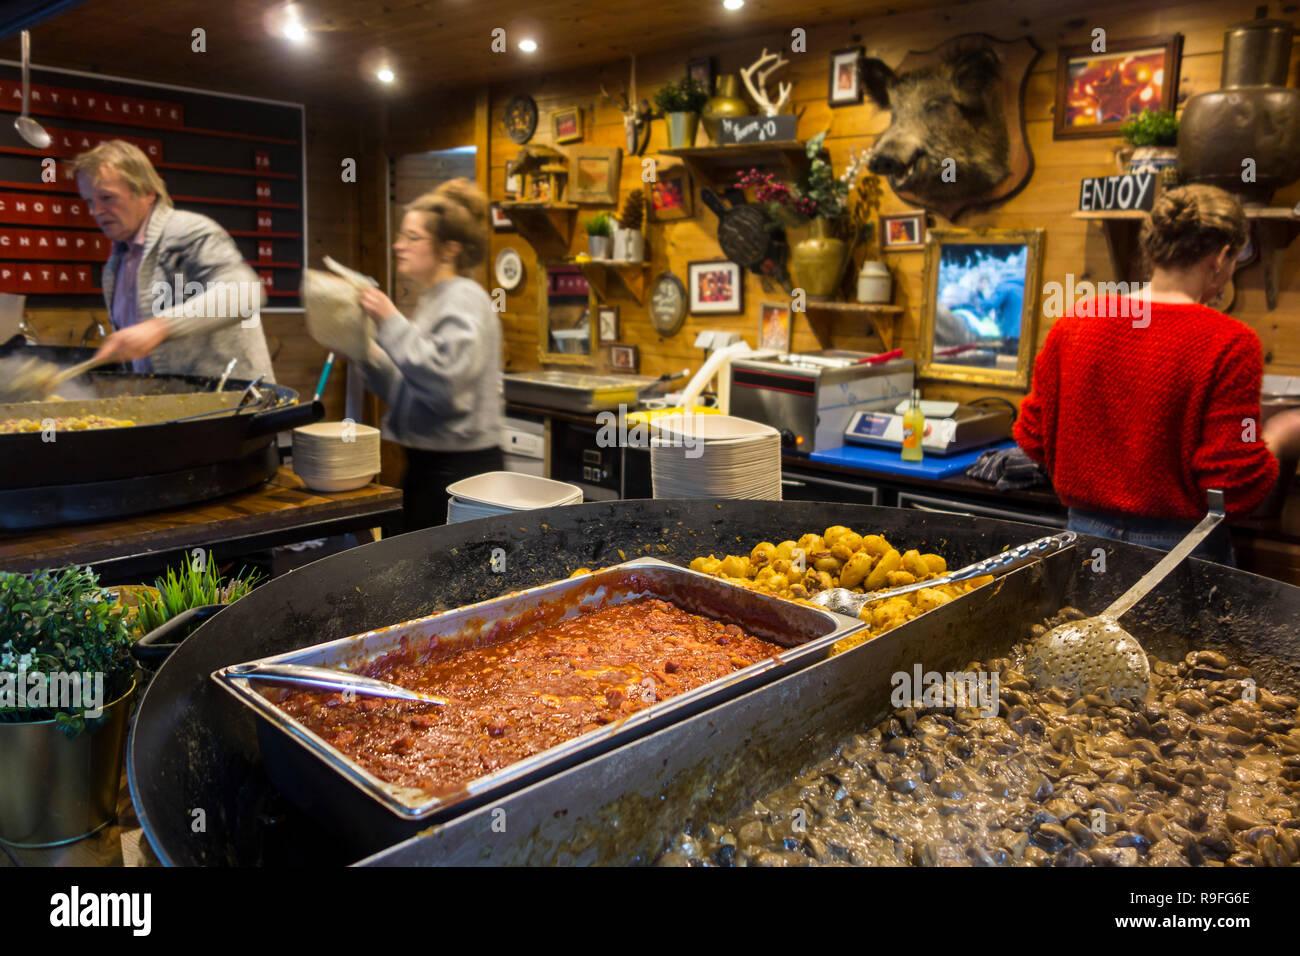 Simmering ingredients in giant pan in food stand at Christmas market in winter in Ghent, Flanders, Belgium - Stock Image